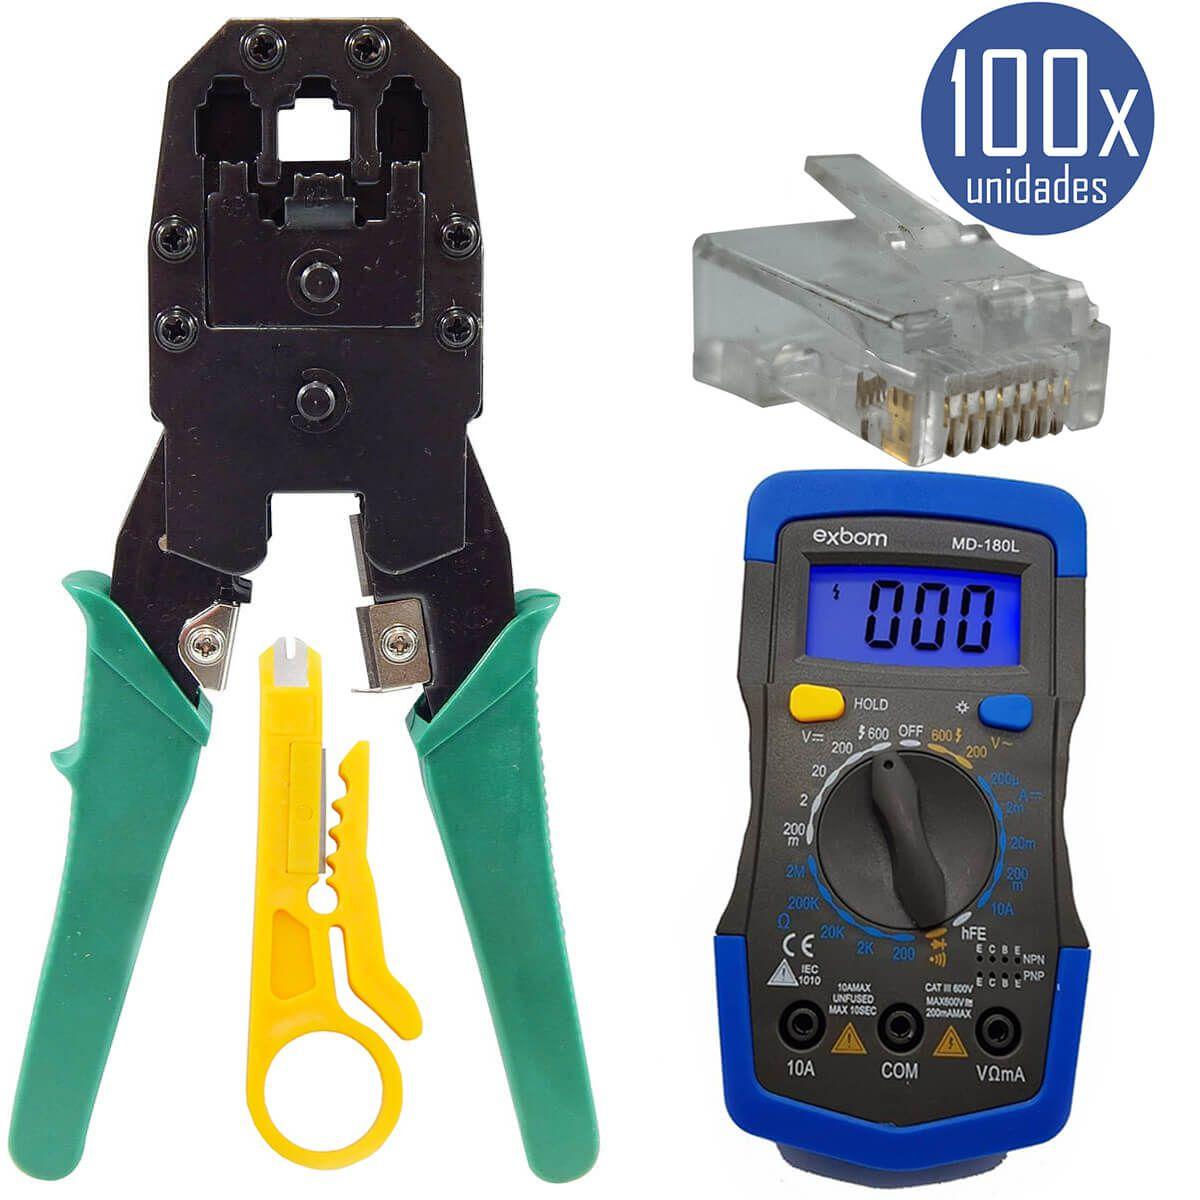 KIT Multímetro Digital MD-180L + Alicate de Crimpagem RJ45 e RJ11 + 100x Conectores RJ45